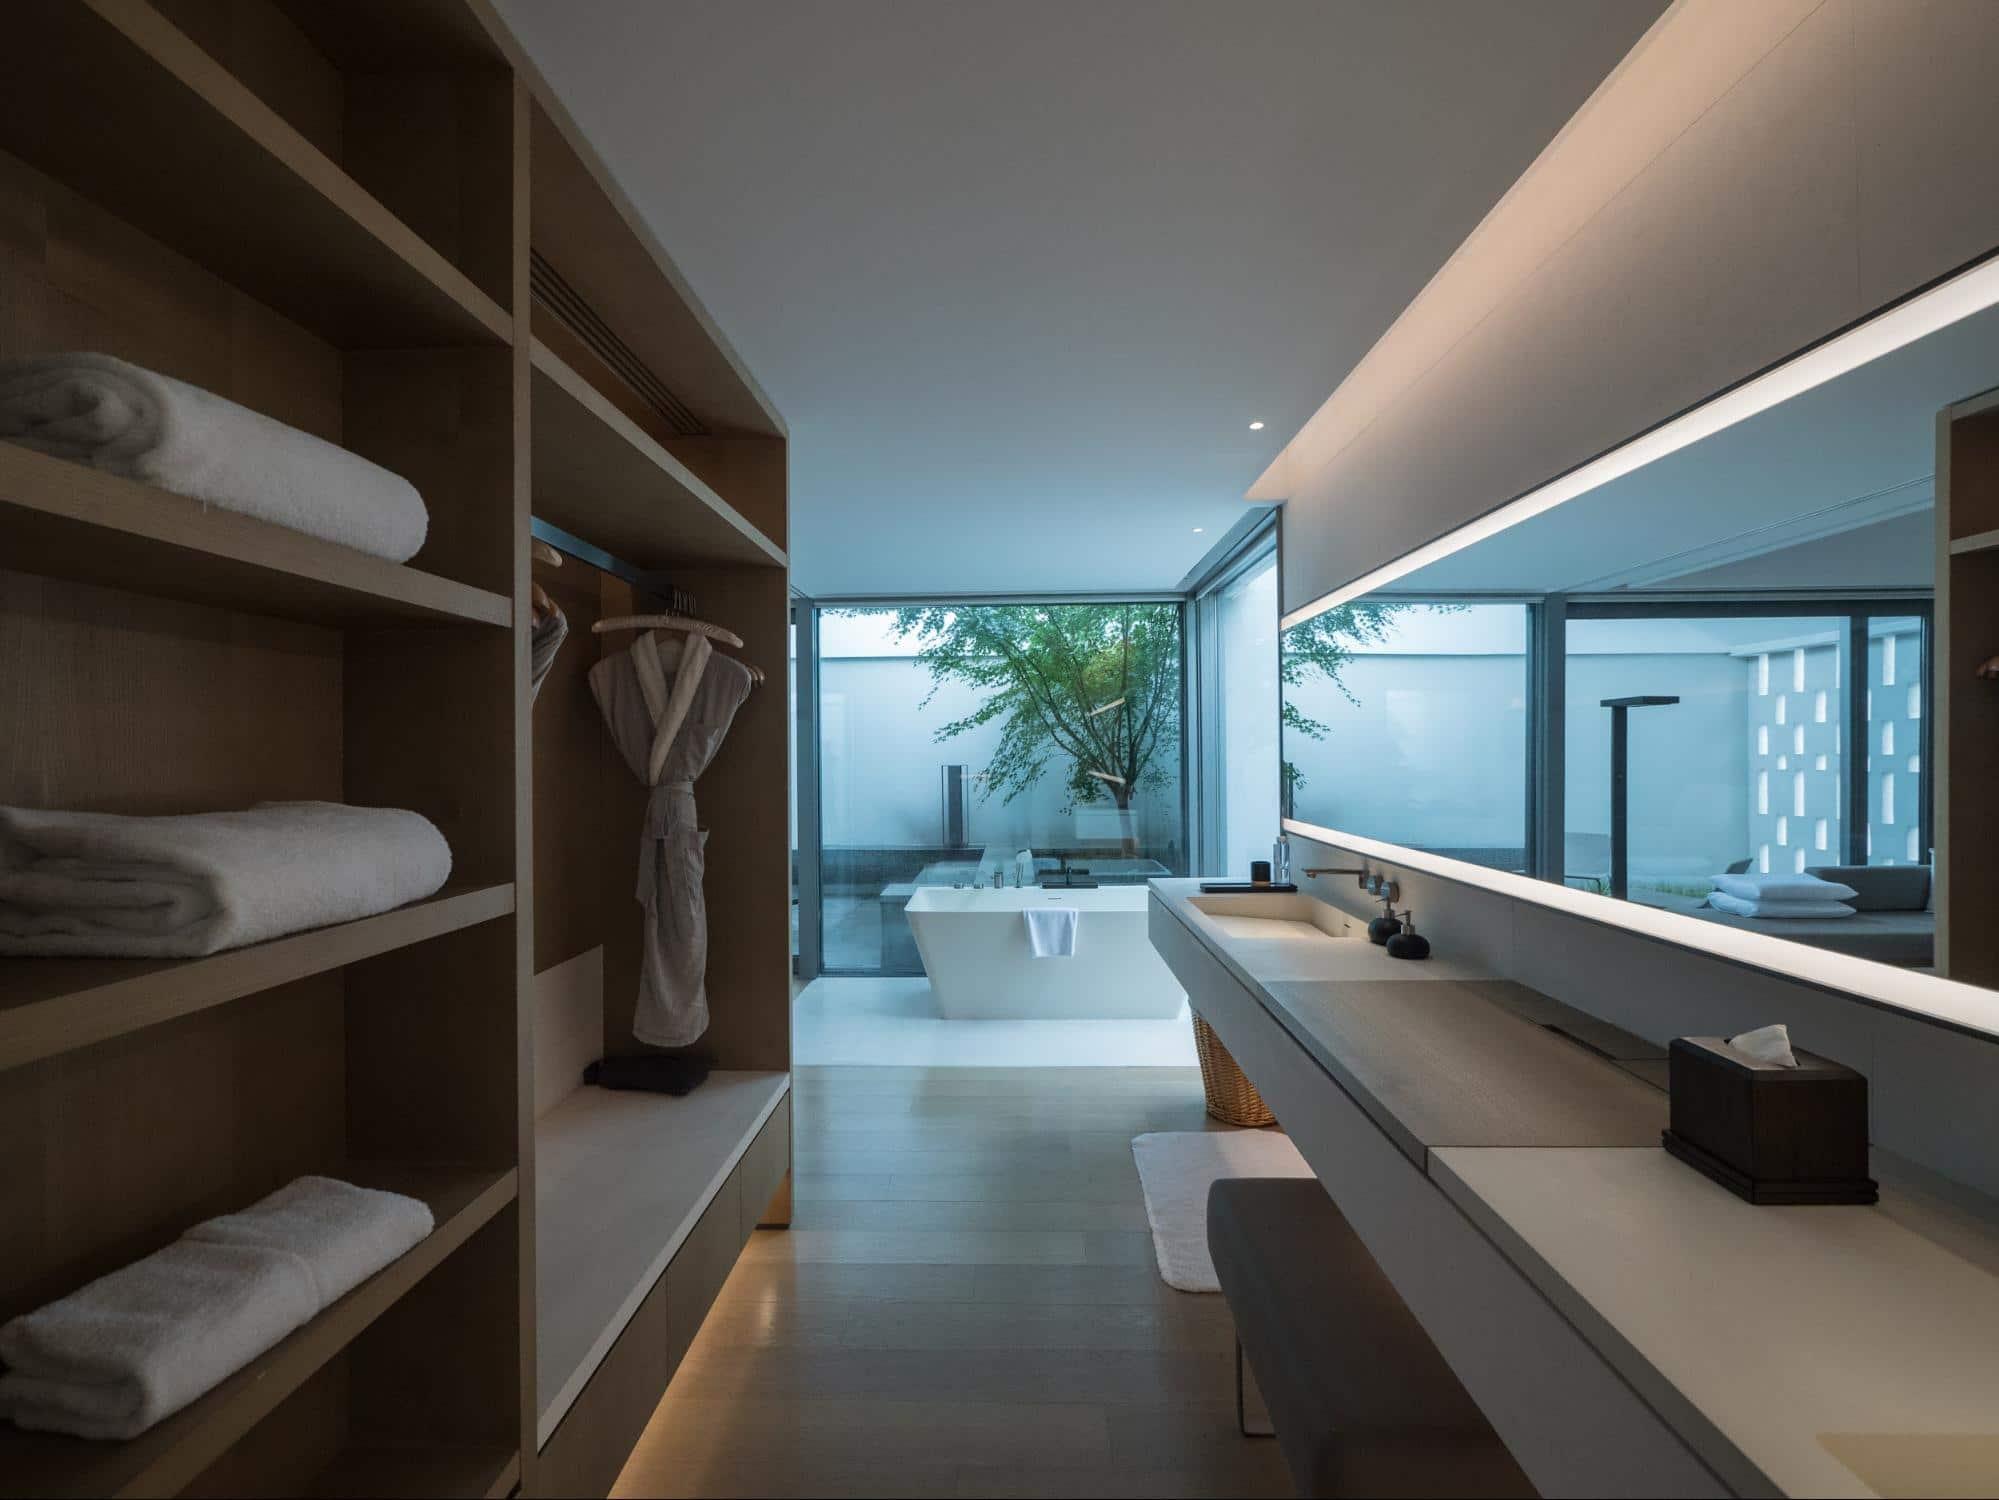 The bathrooms at Alila Wuzhen